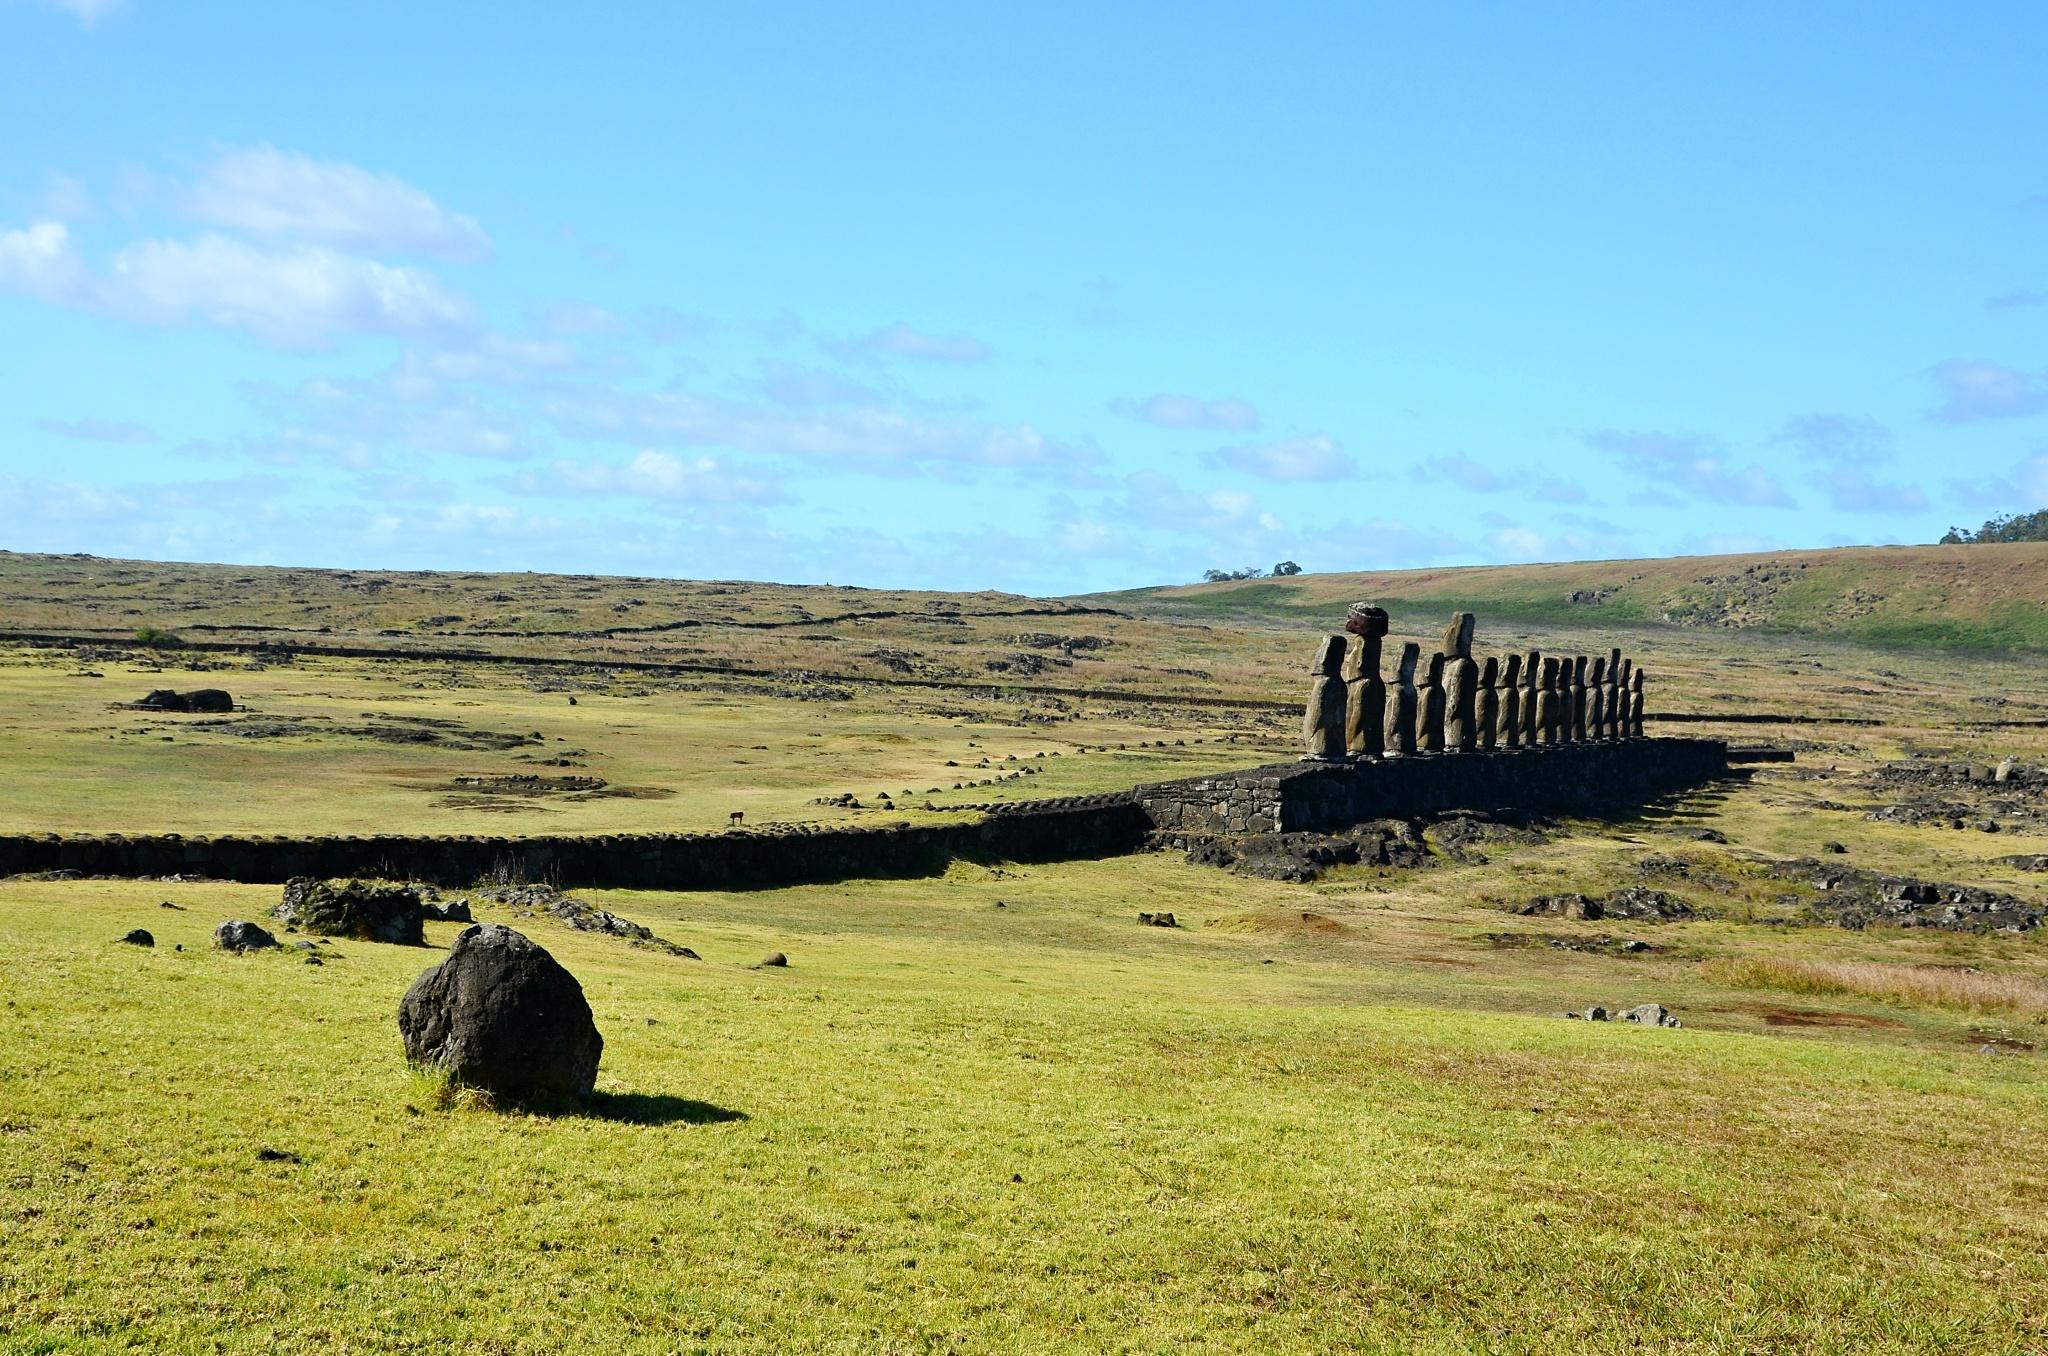 15 Moai na místě Ahu Tongariki